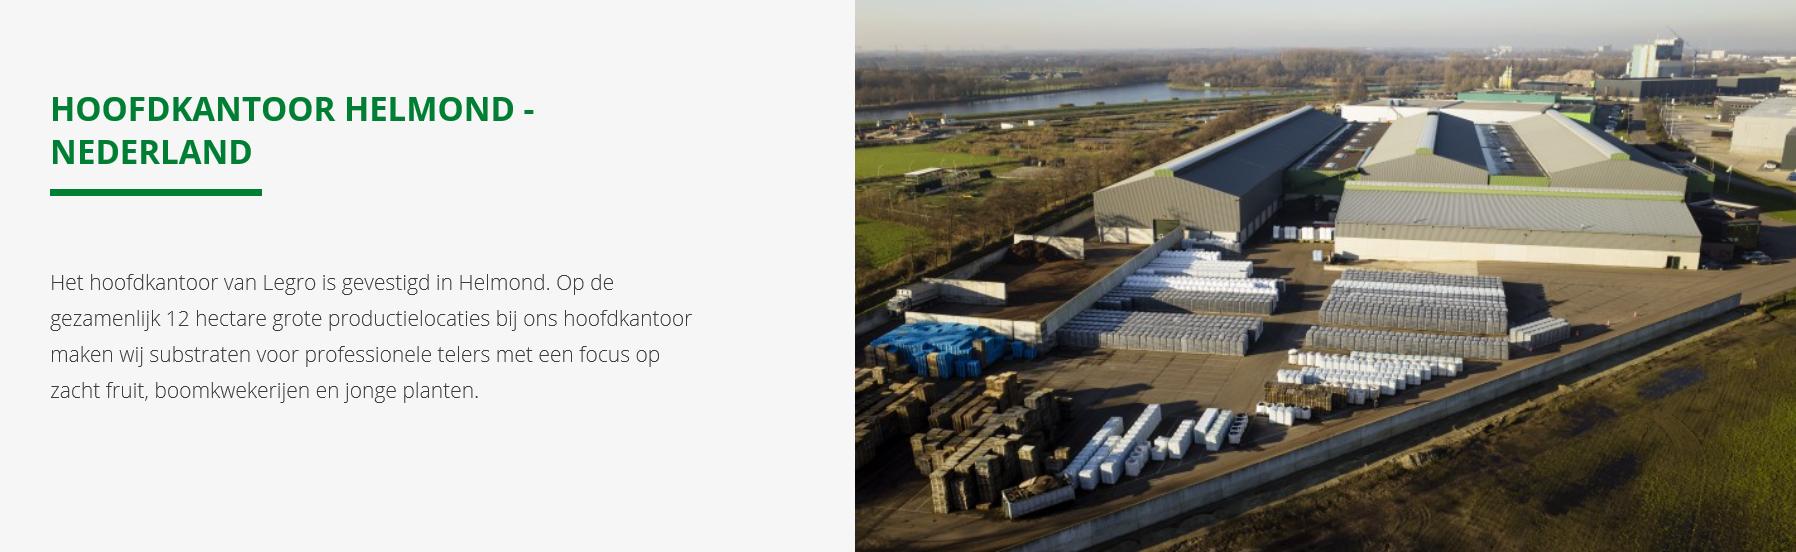 Hoofdkantoor-Helmond-Nederland-2